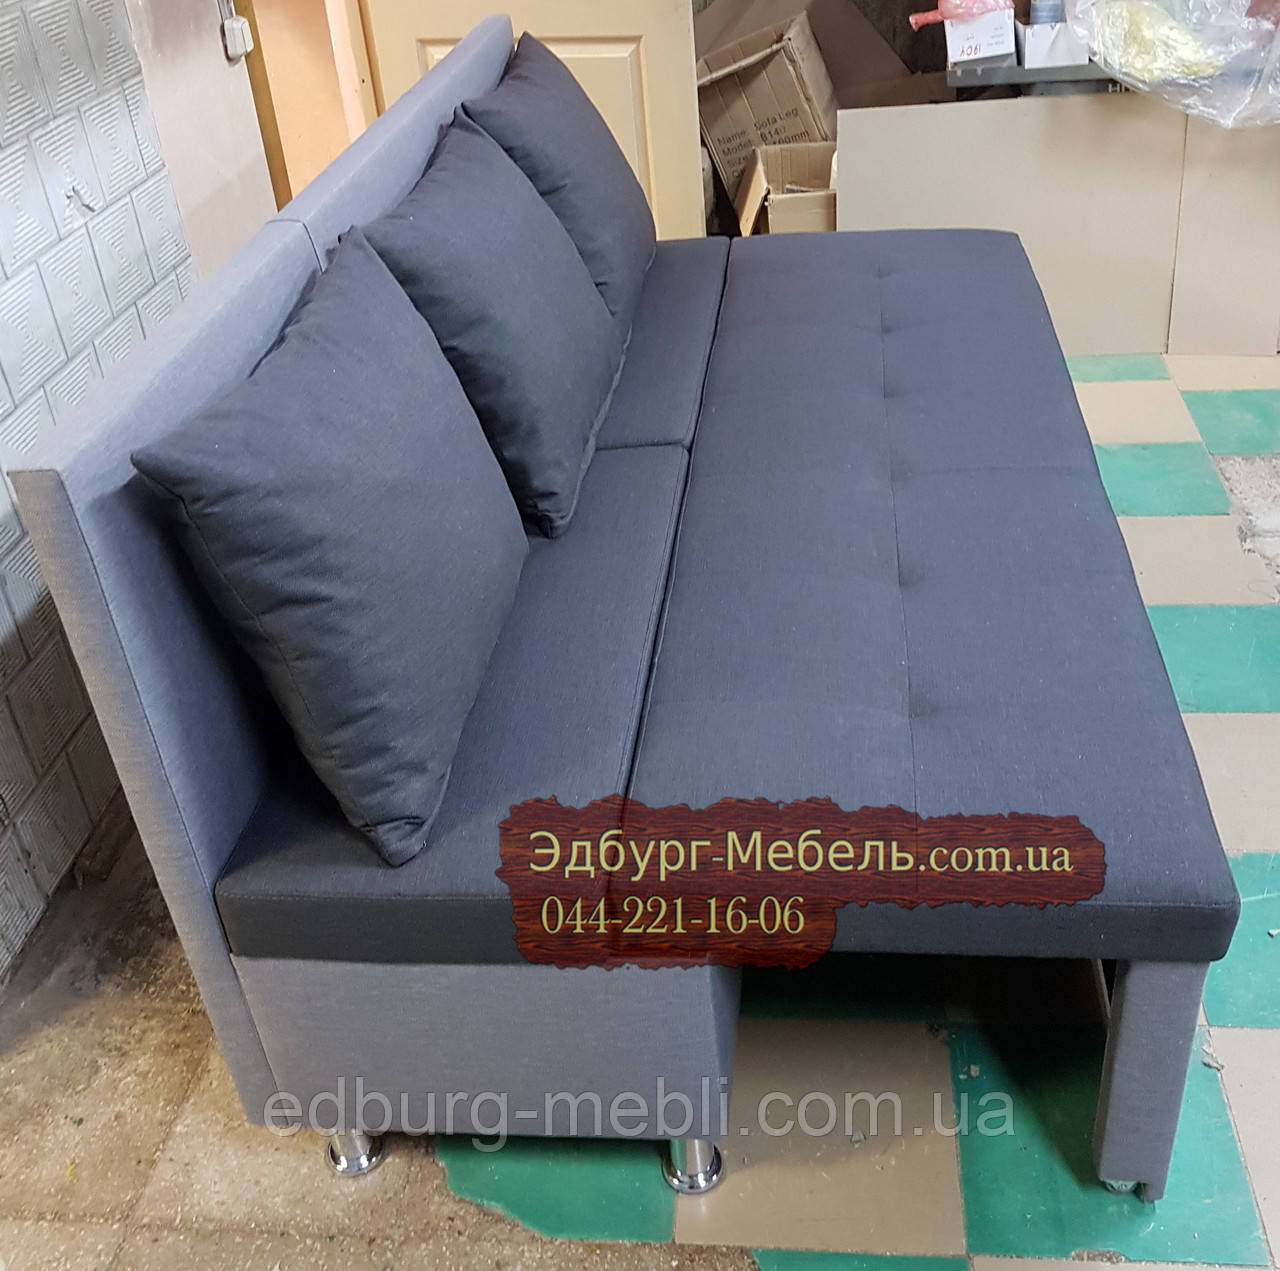 диван для узкой кухни водоотталкивающая ткань продажа цена в